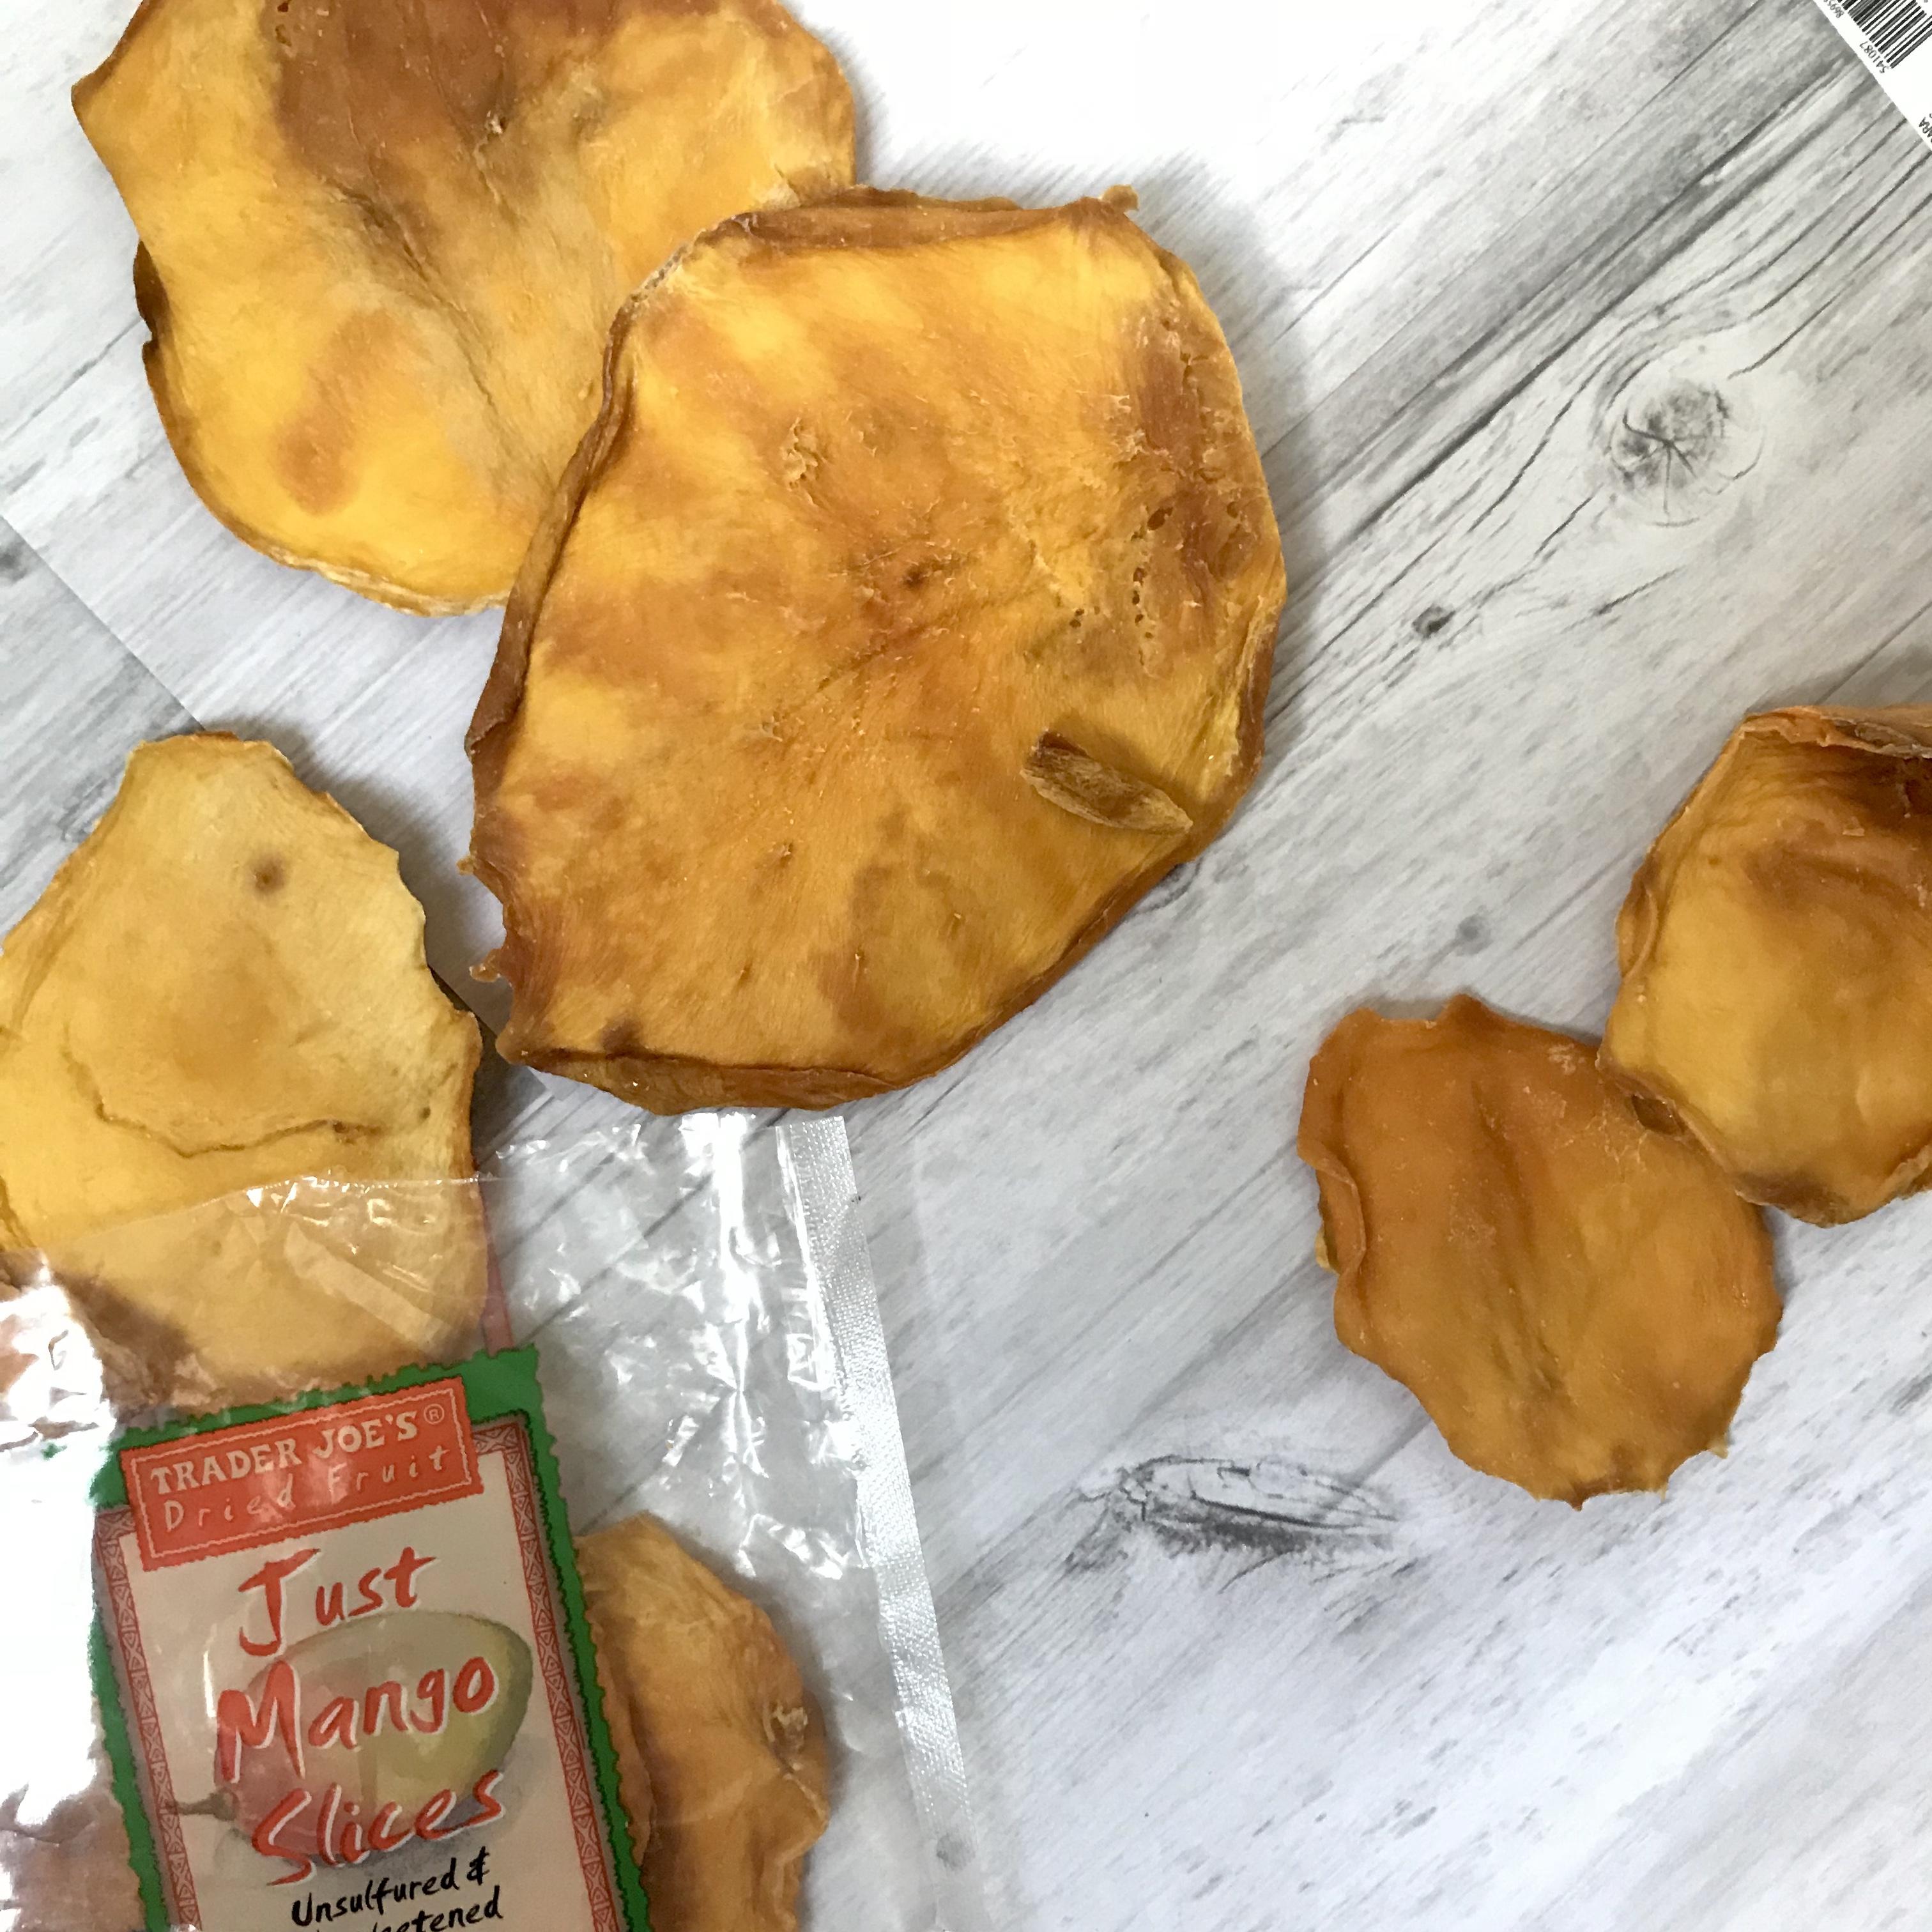 trader joe's just mango slices, dried mango, natural dried mango slices